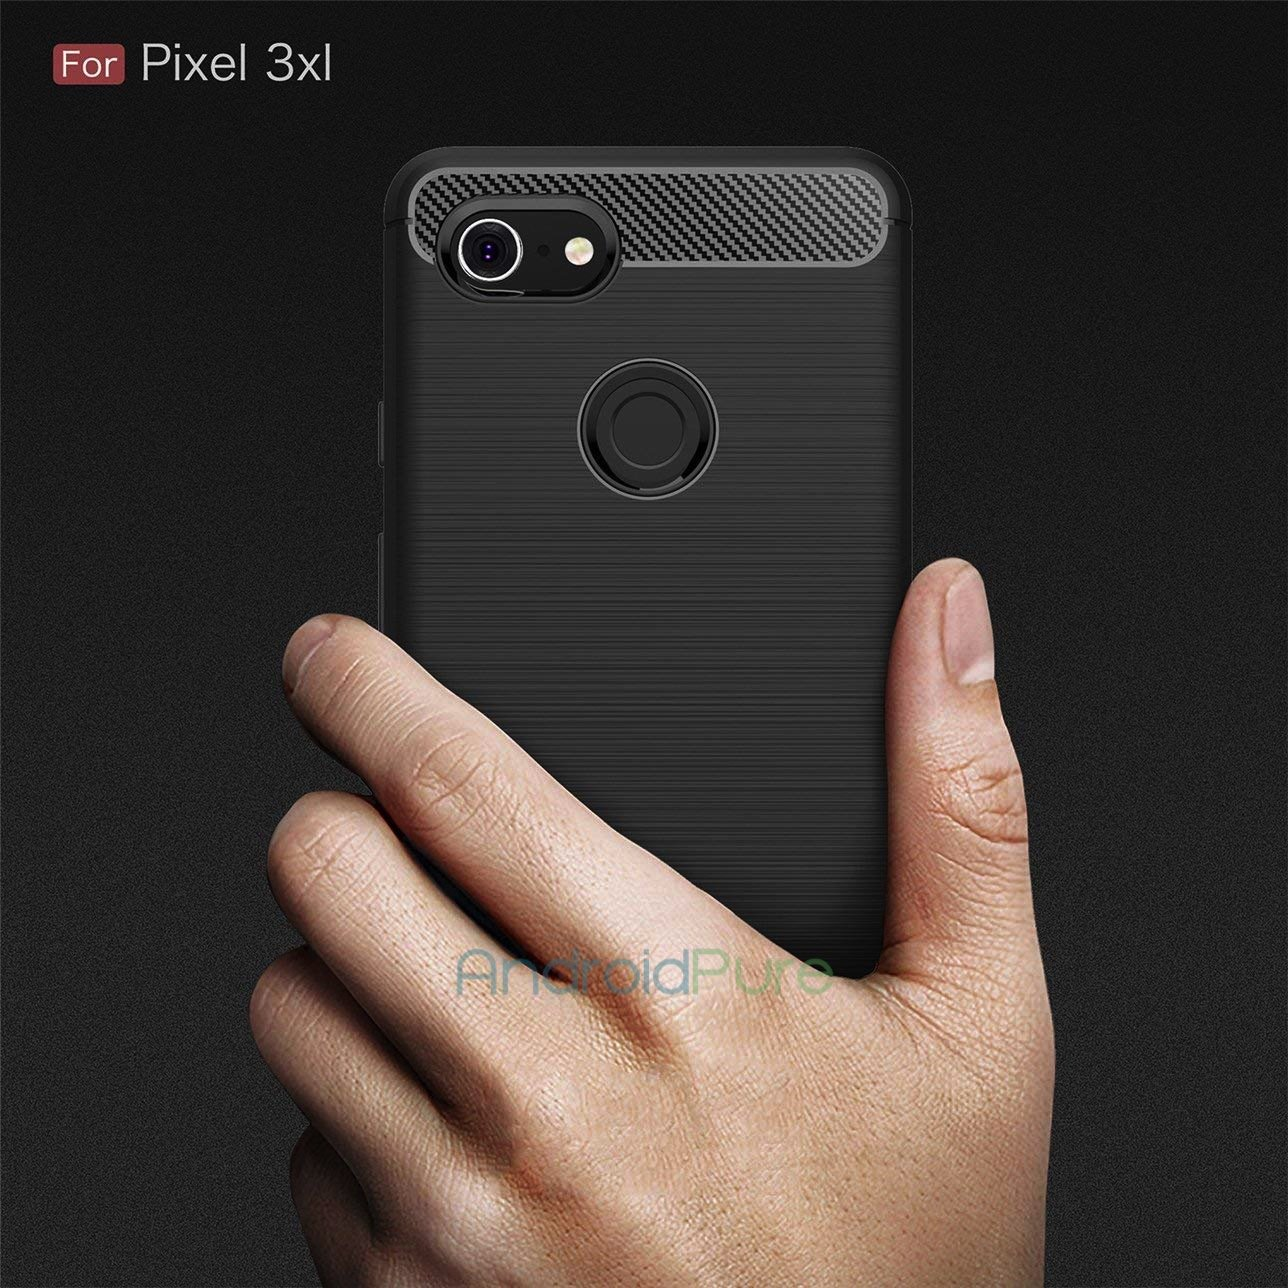 PIXEL 3 XL j Exclusive: Pixel 3 XL leaked cases reveal notch, single rear camera 9 Leaks | News | Phones